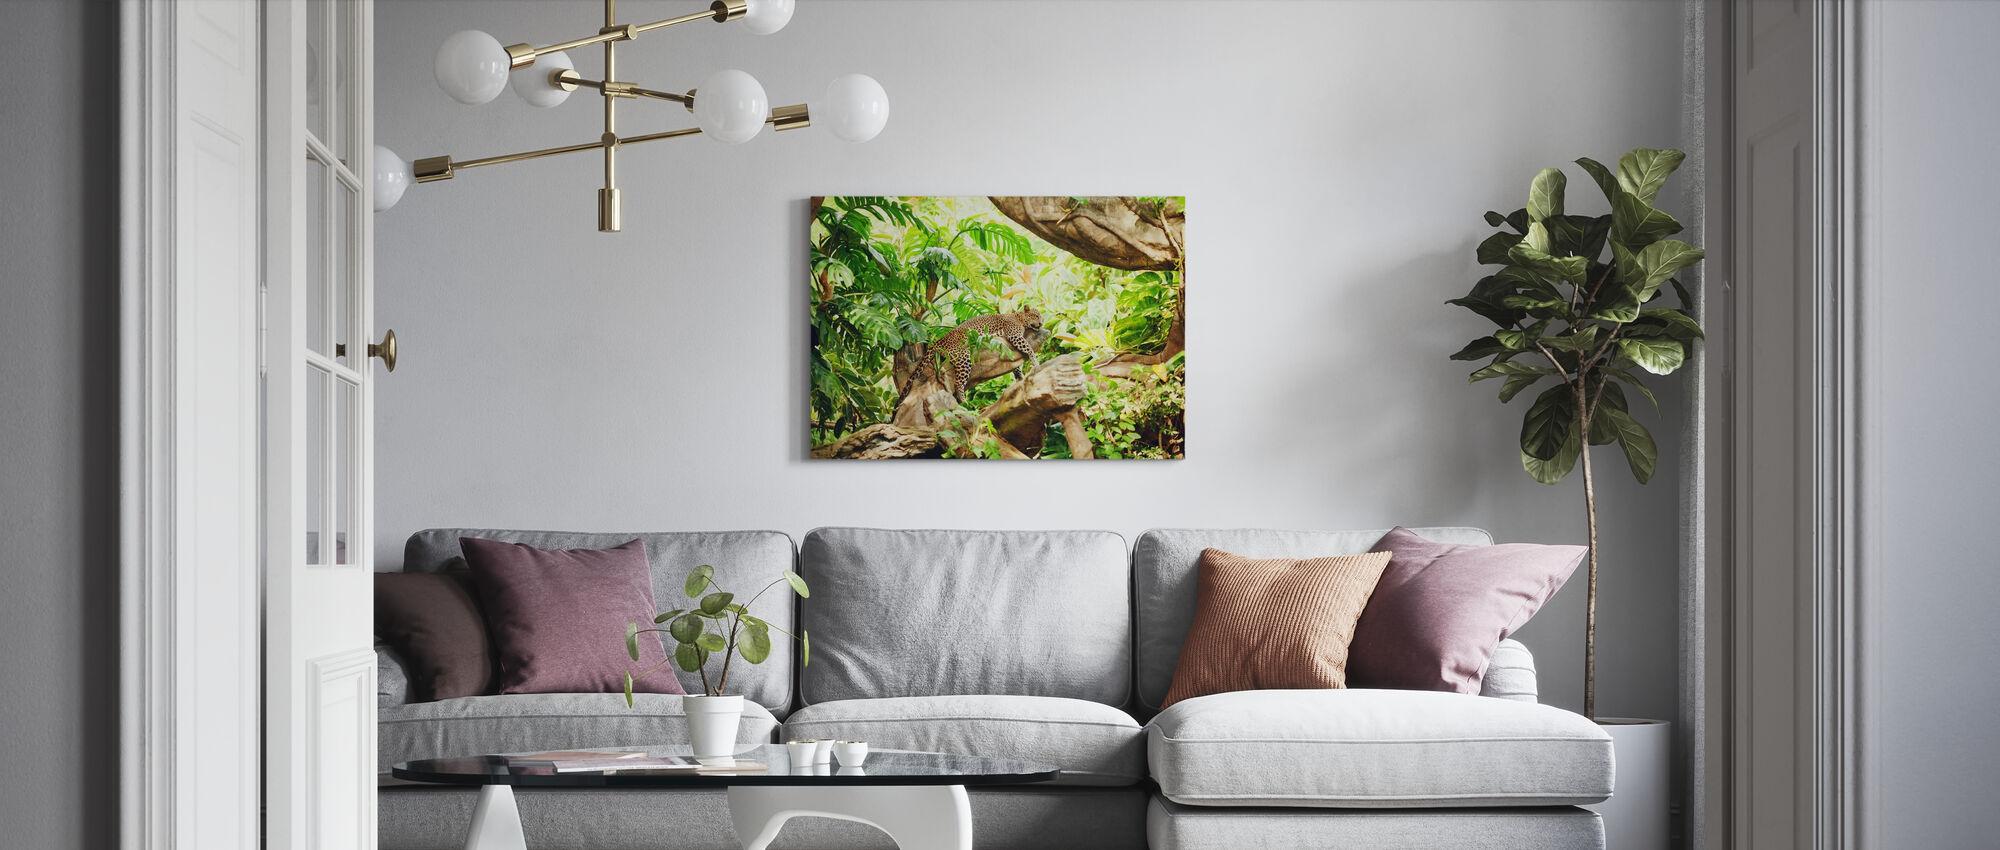 Leopard Dozing i djungeln - Canvastavla - Vardagsrum